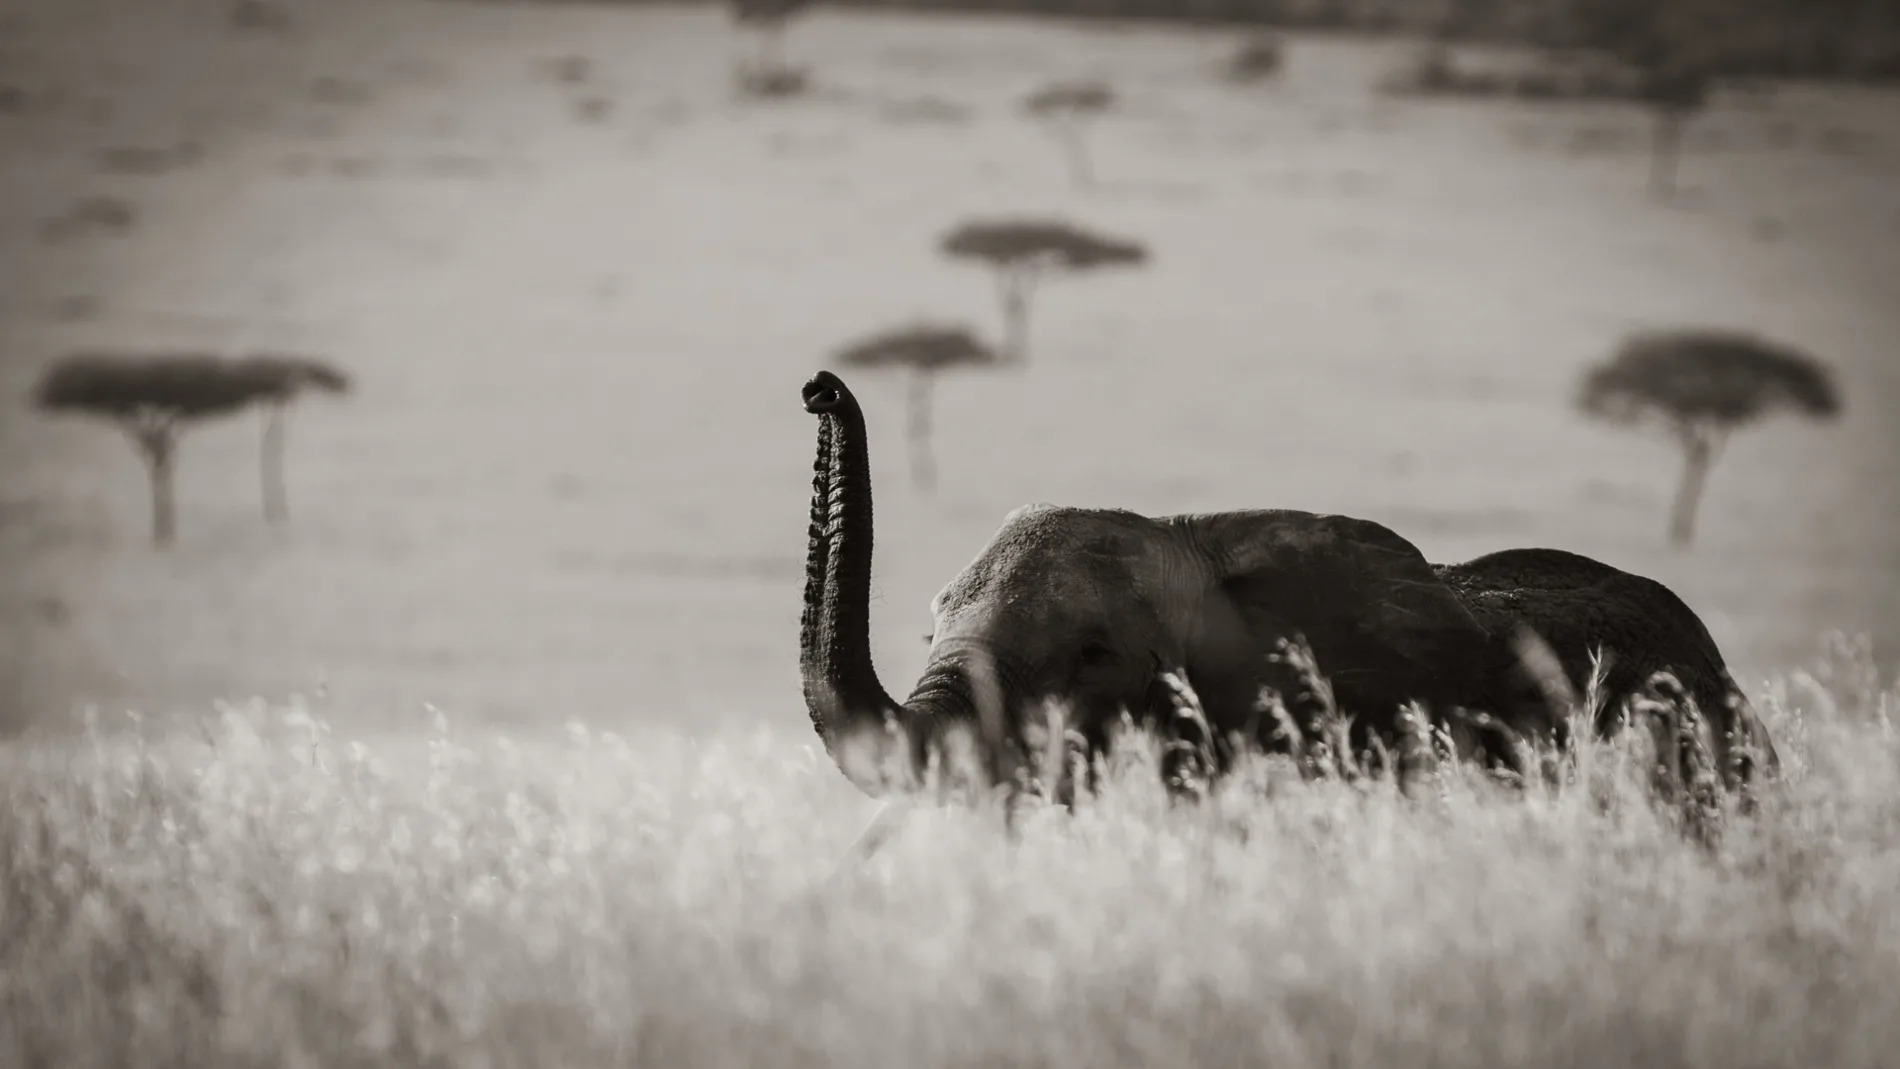 Elephant long grass